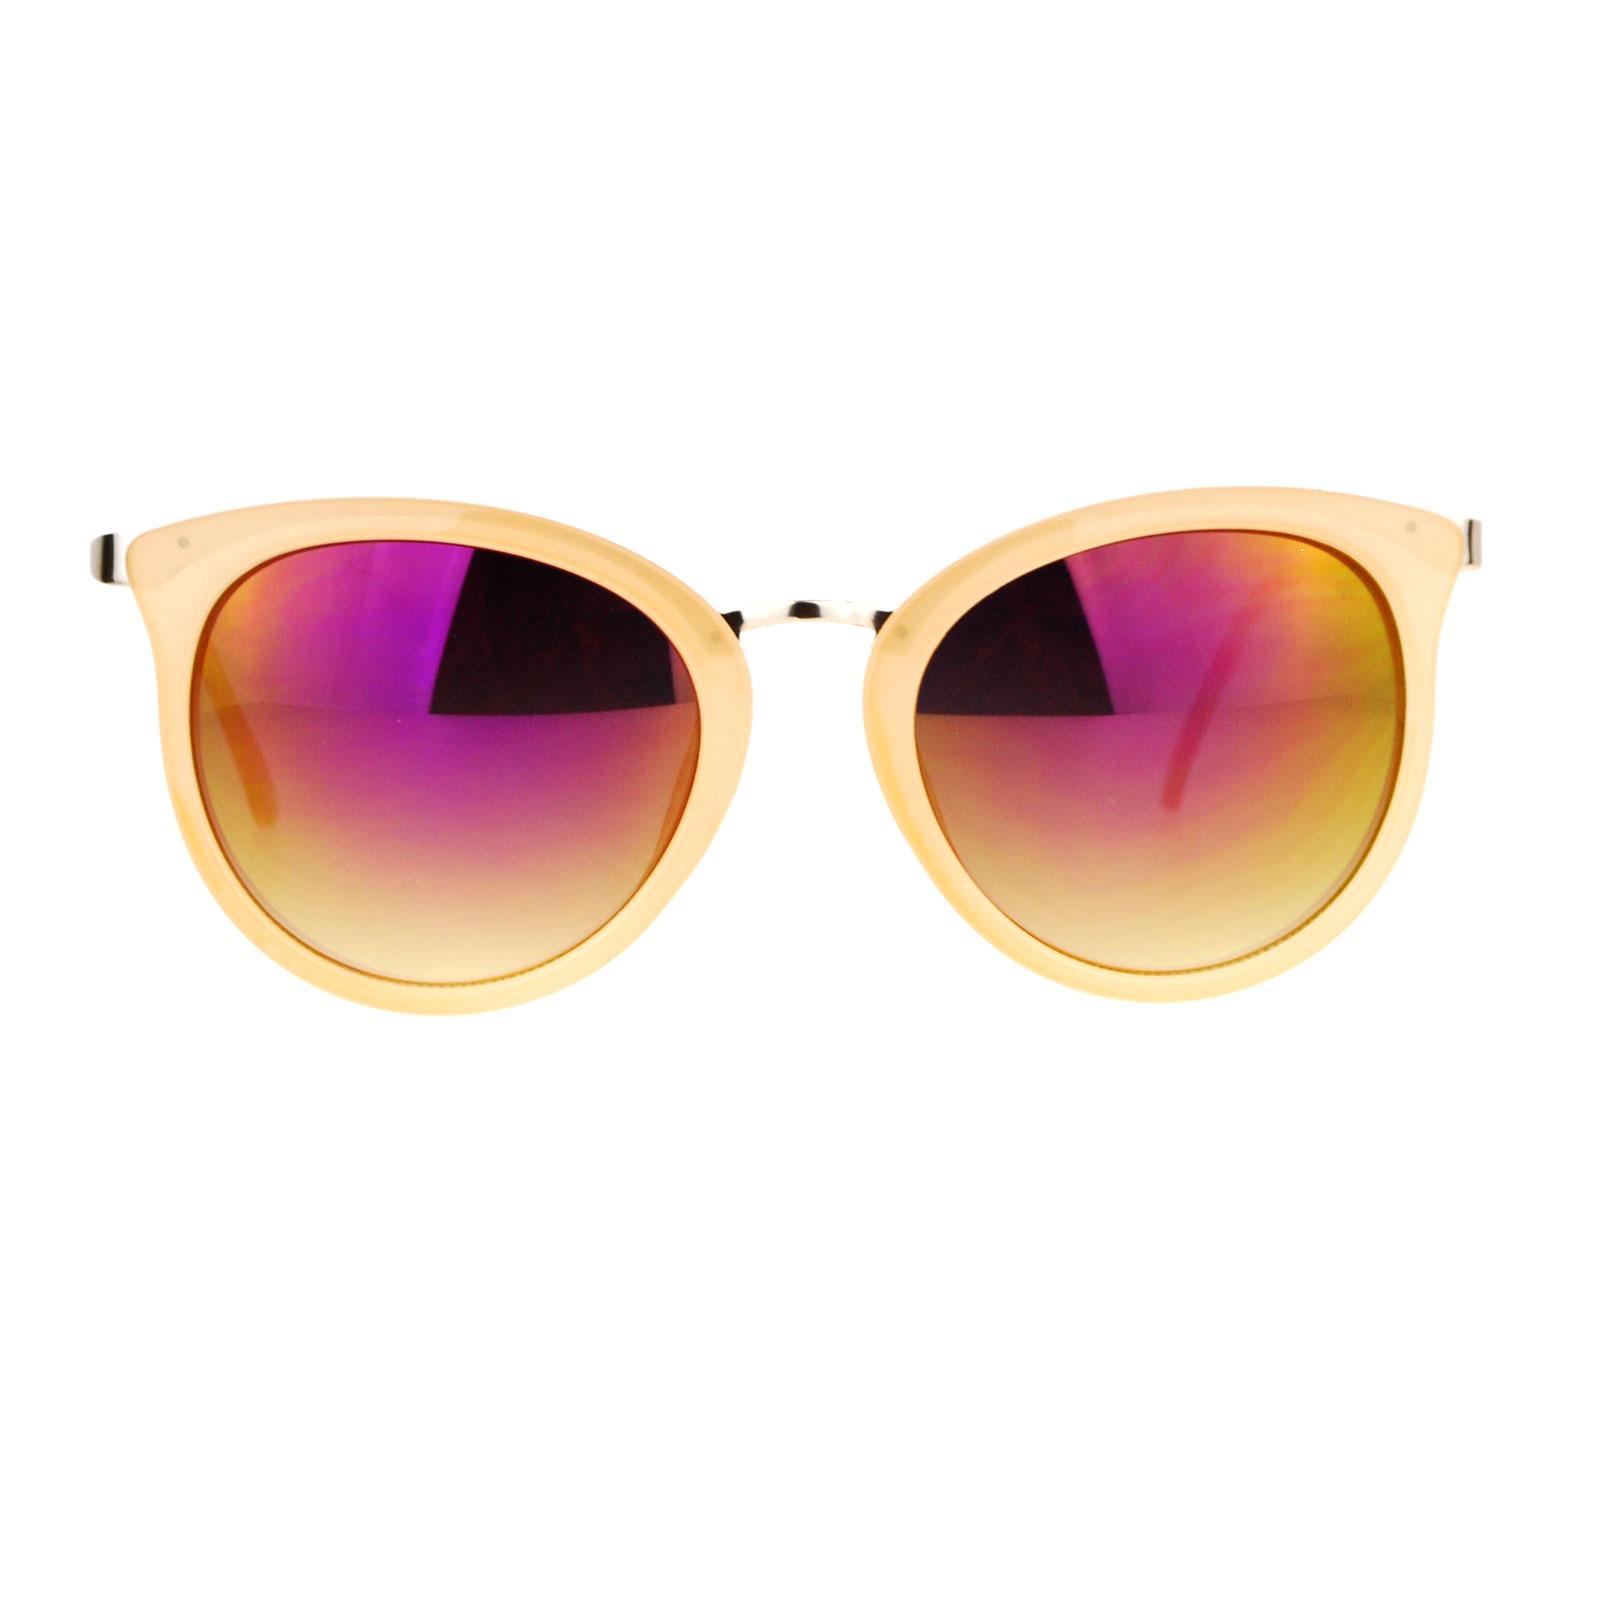 Colored Lens Sunglasses  sa106 womens bat shape cat eye color mirror lens sunglasses ebay